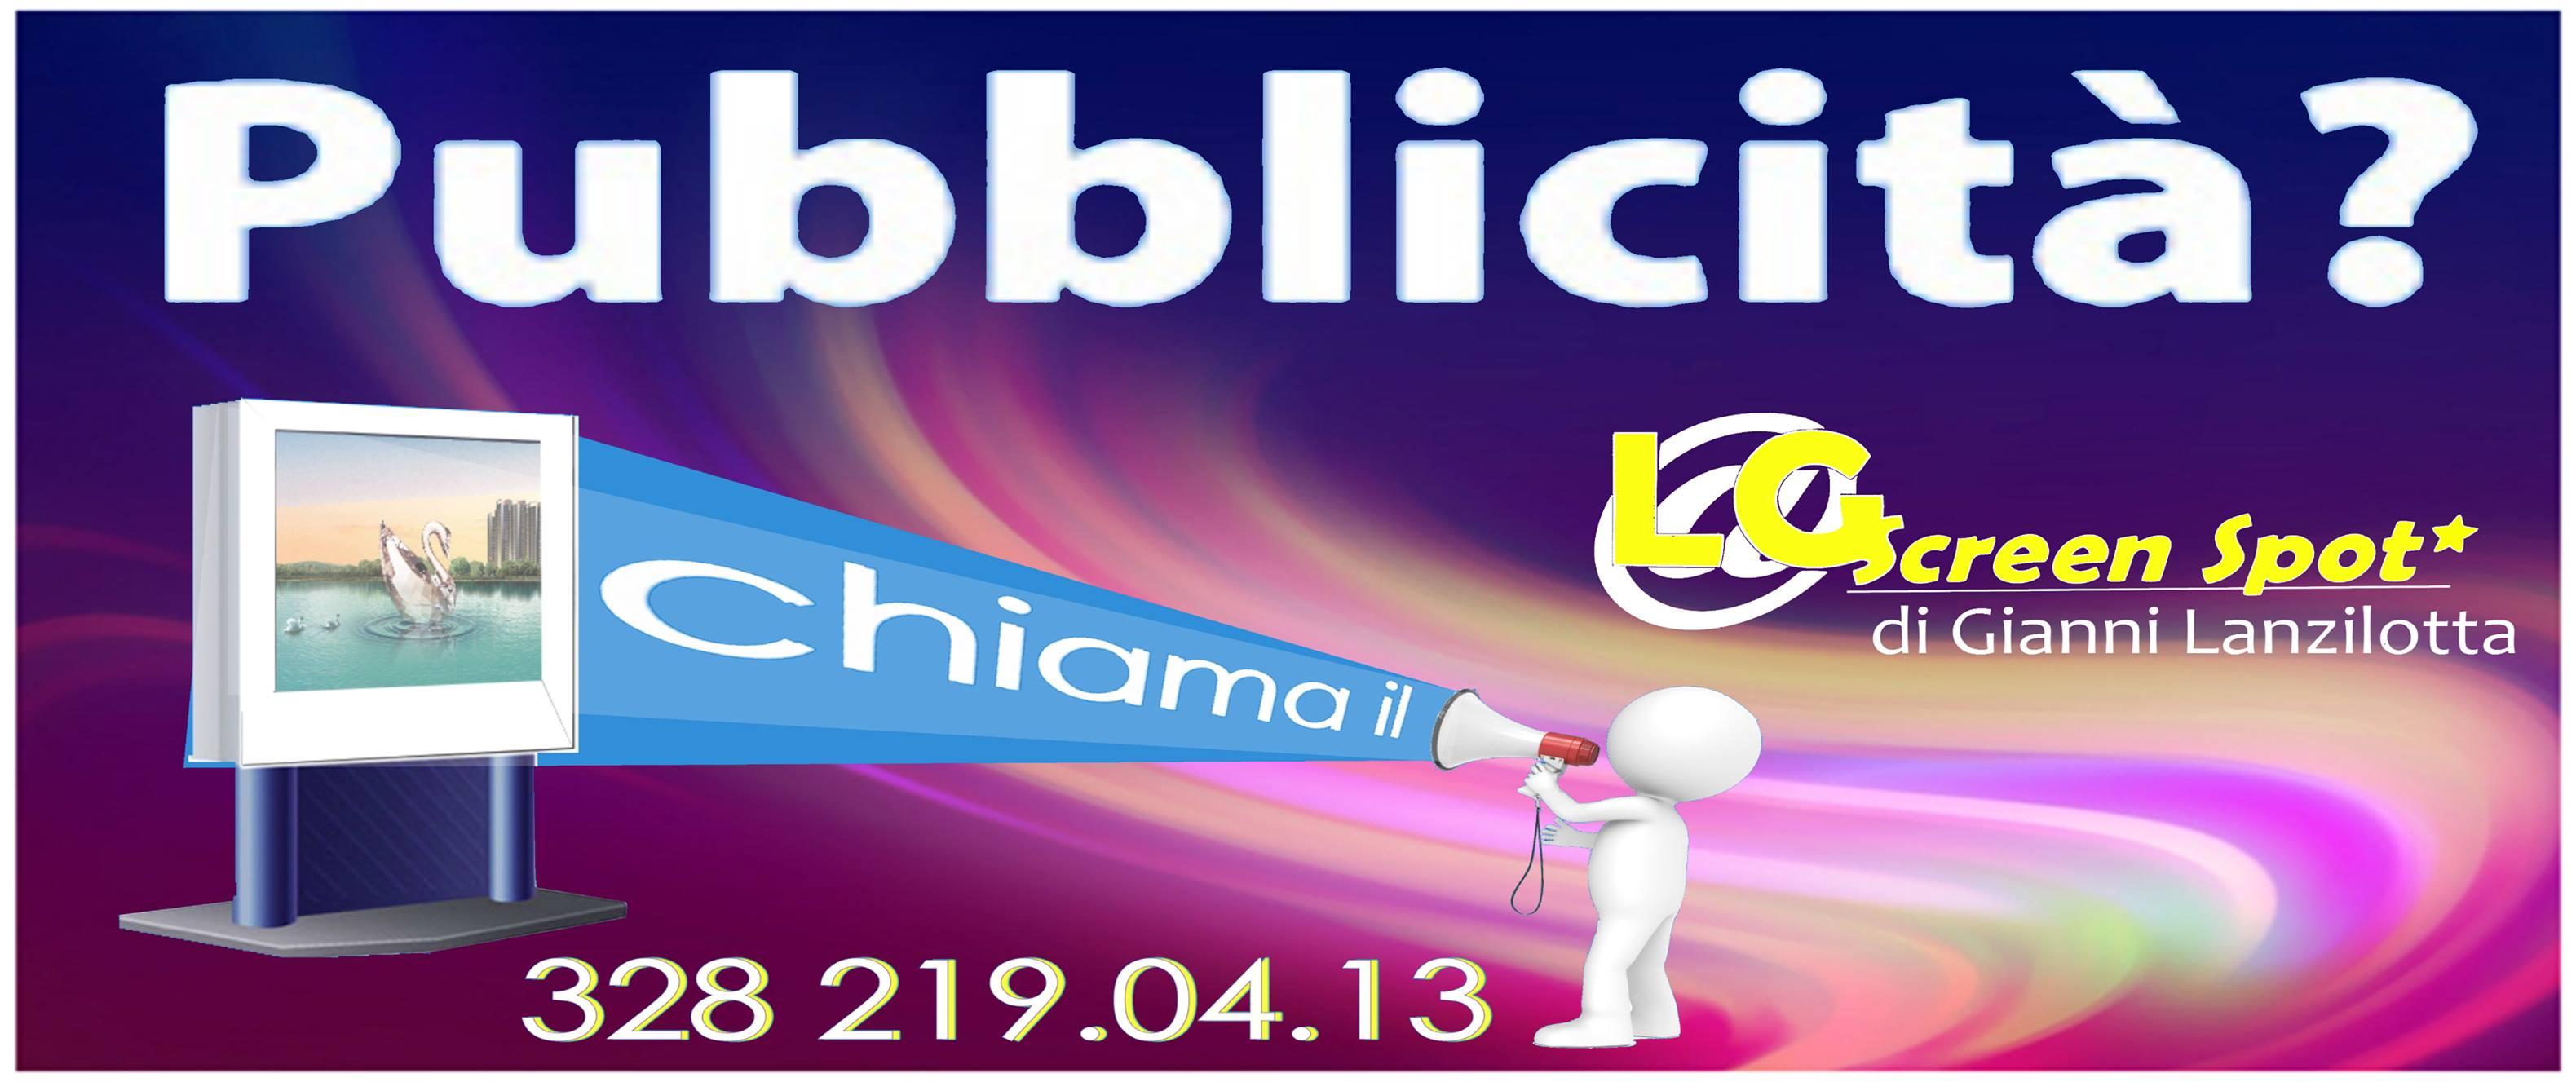 LG ScreenSpot cartellonistica luminosa a Castellana Grotte (Bari)